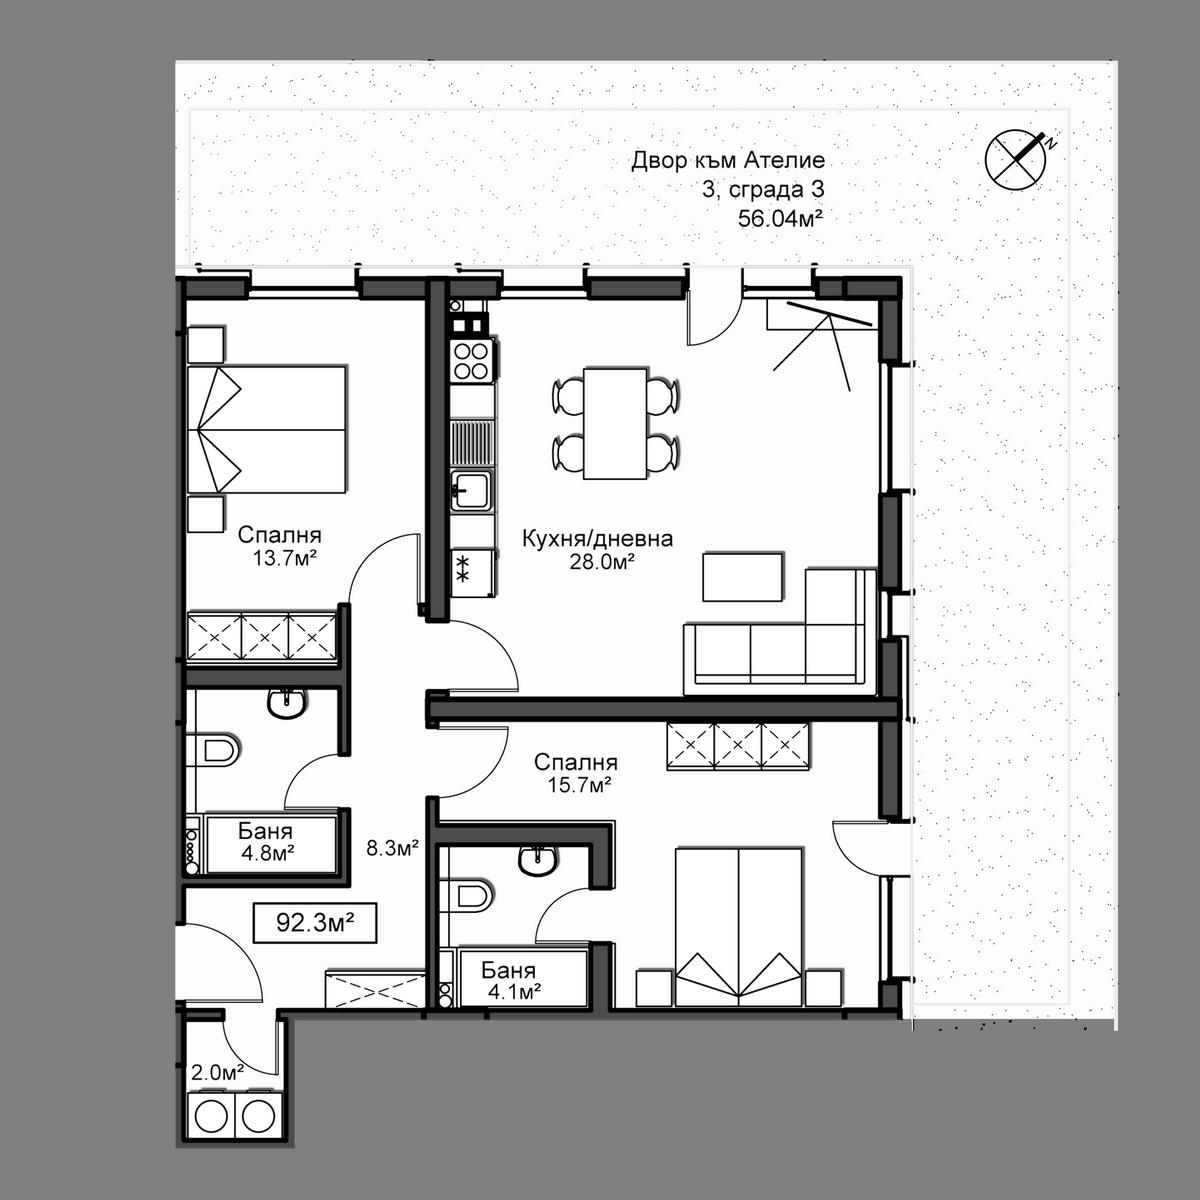 Продава апартамент ново строителство - Апартамент 3